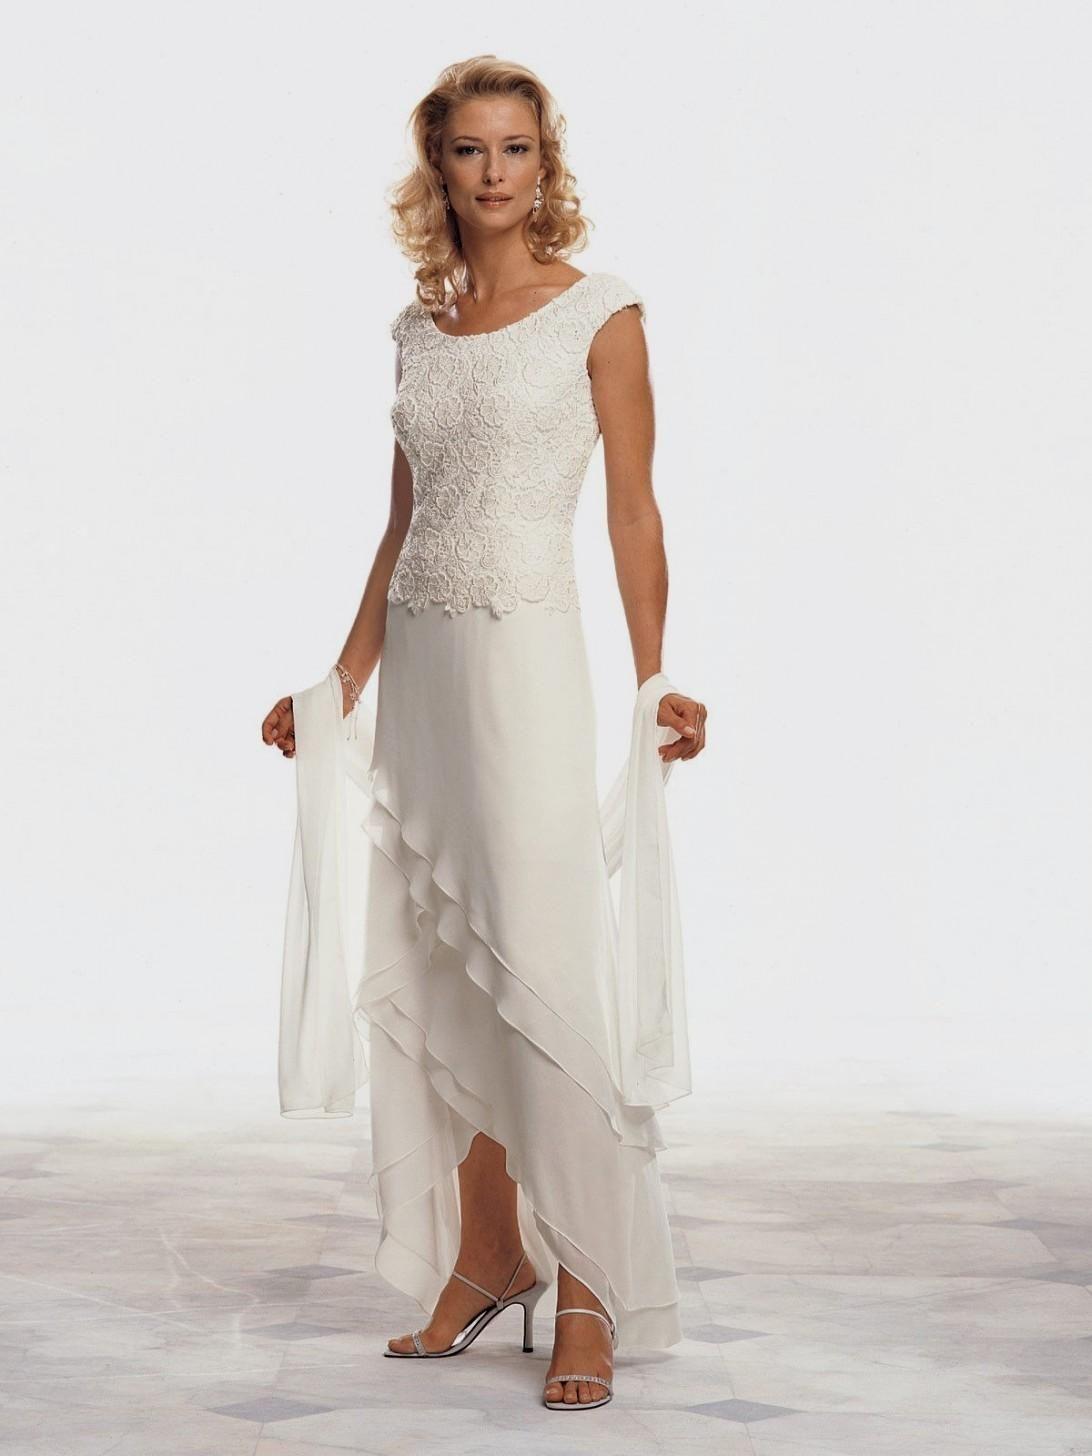 Groom Dresses Mother Of The Beach Wedding